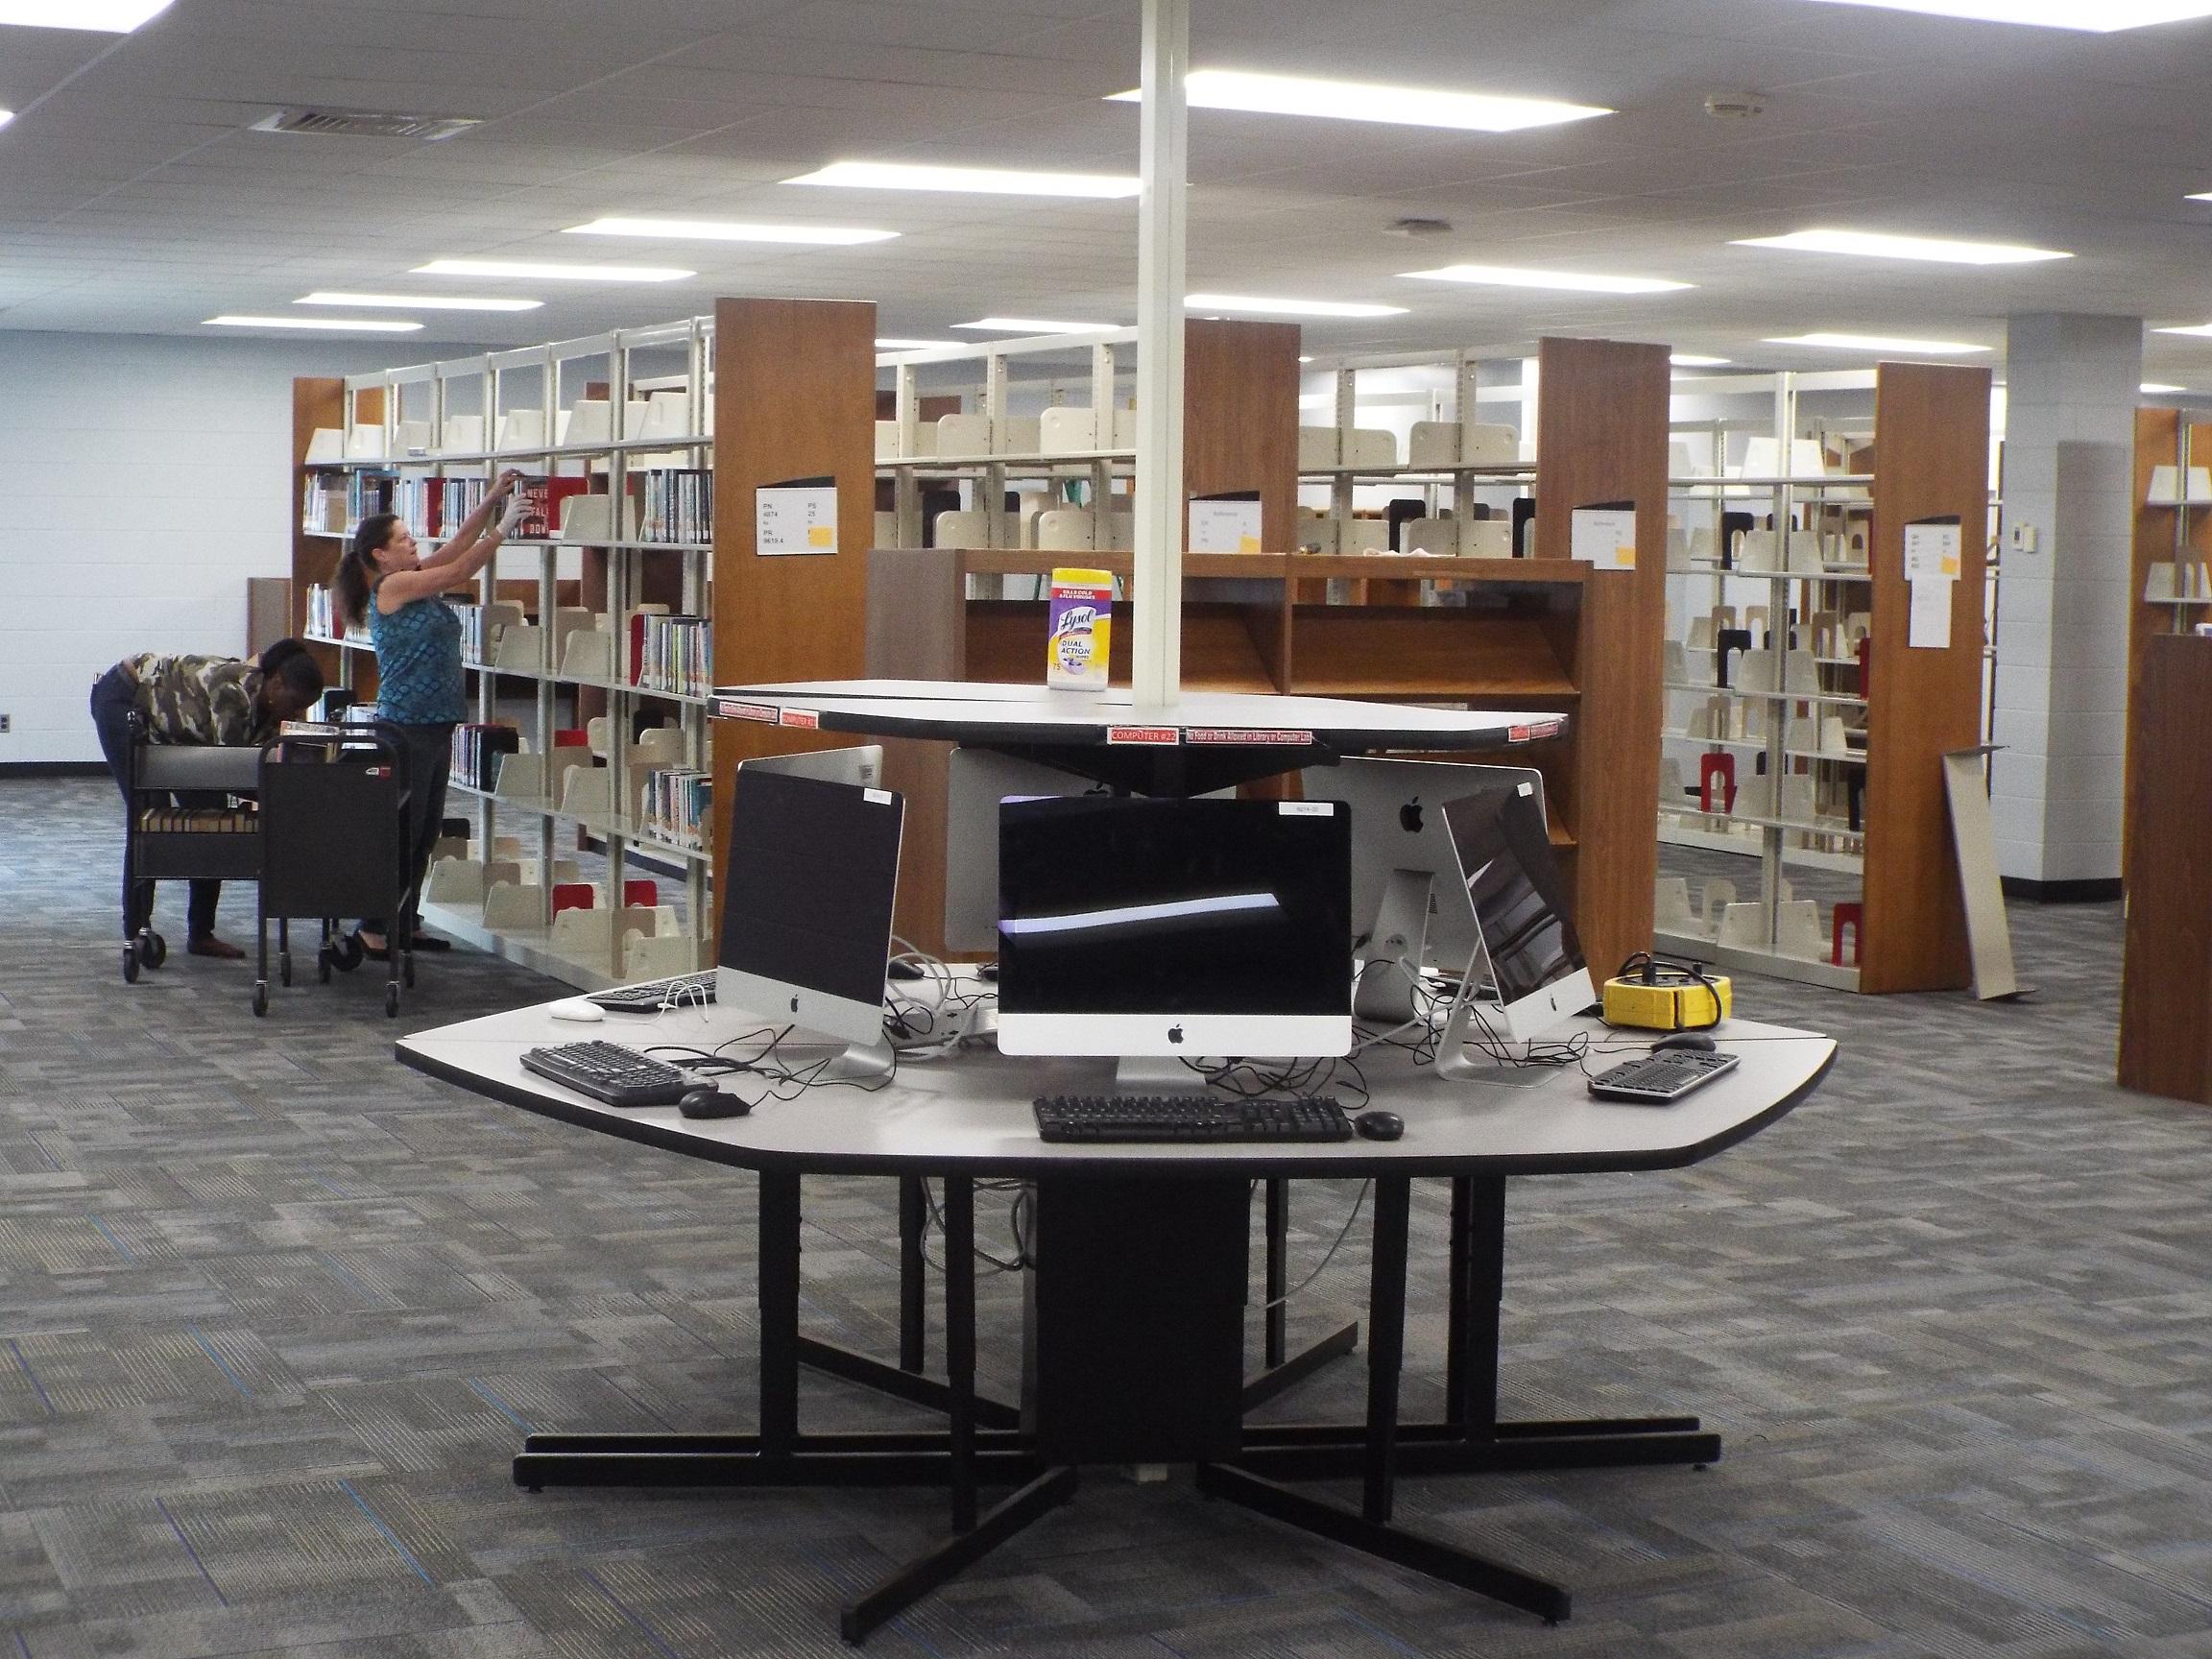 Re-shelving the Books